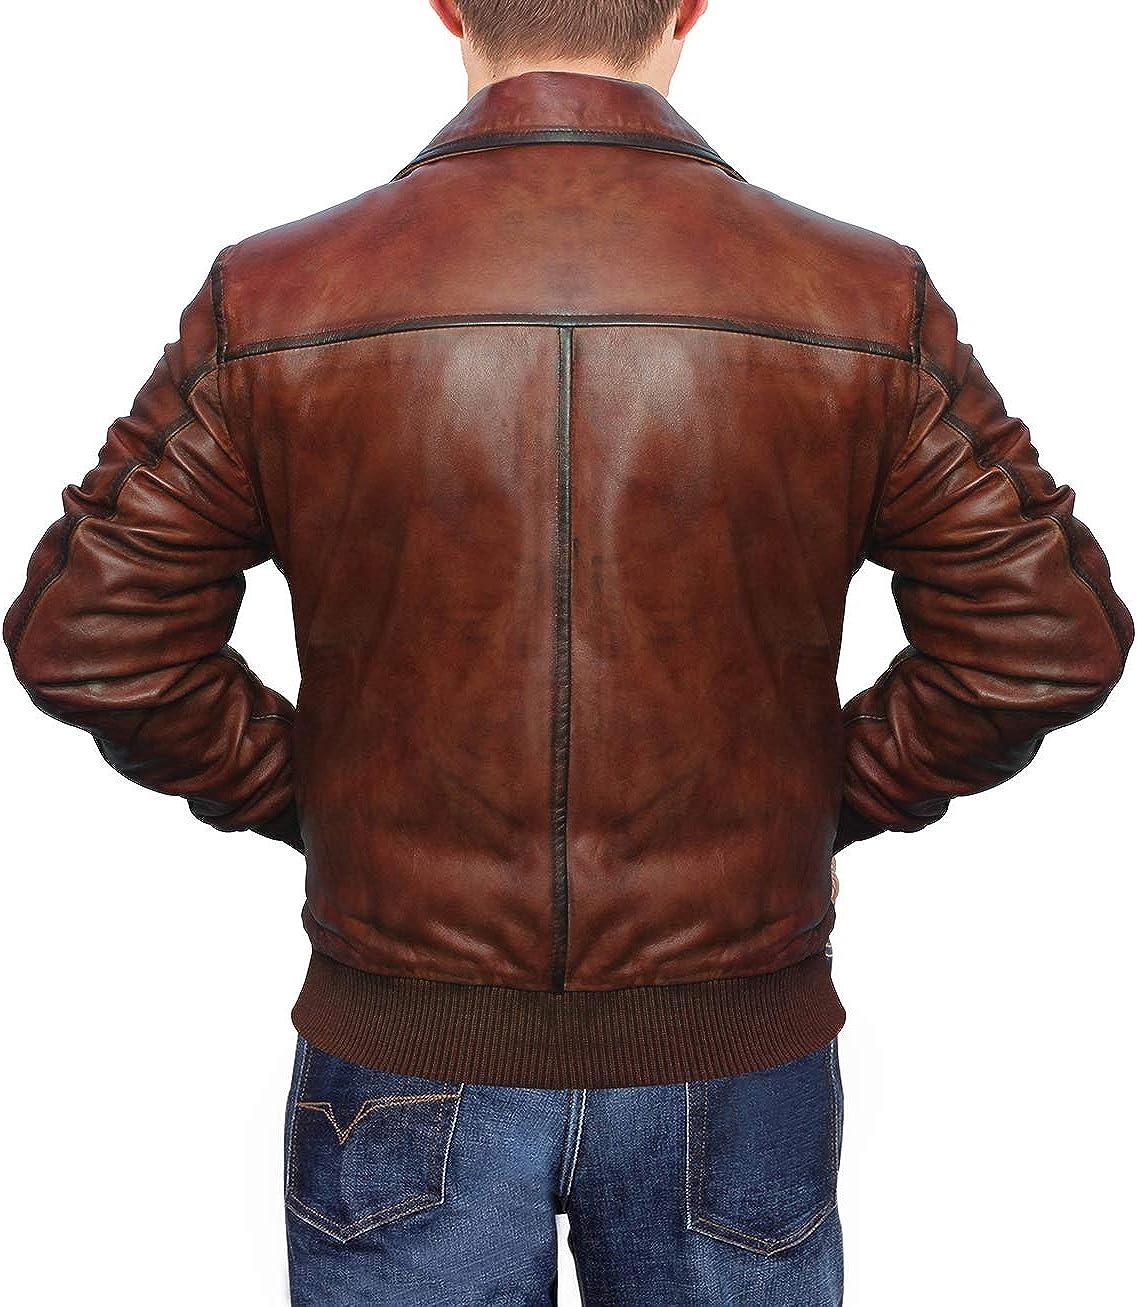 Mens Distressed Brown Vintage Bomber Leather Jacket